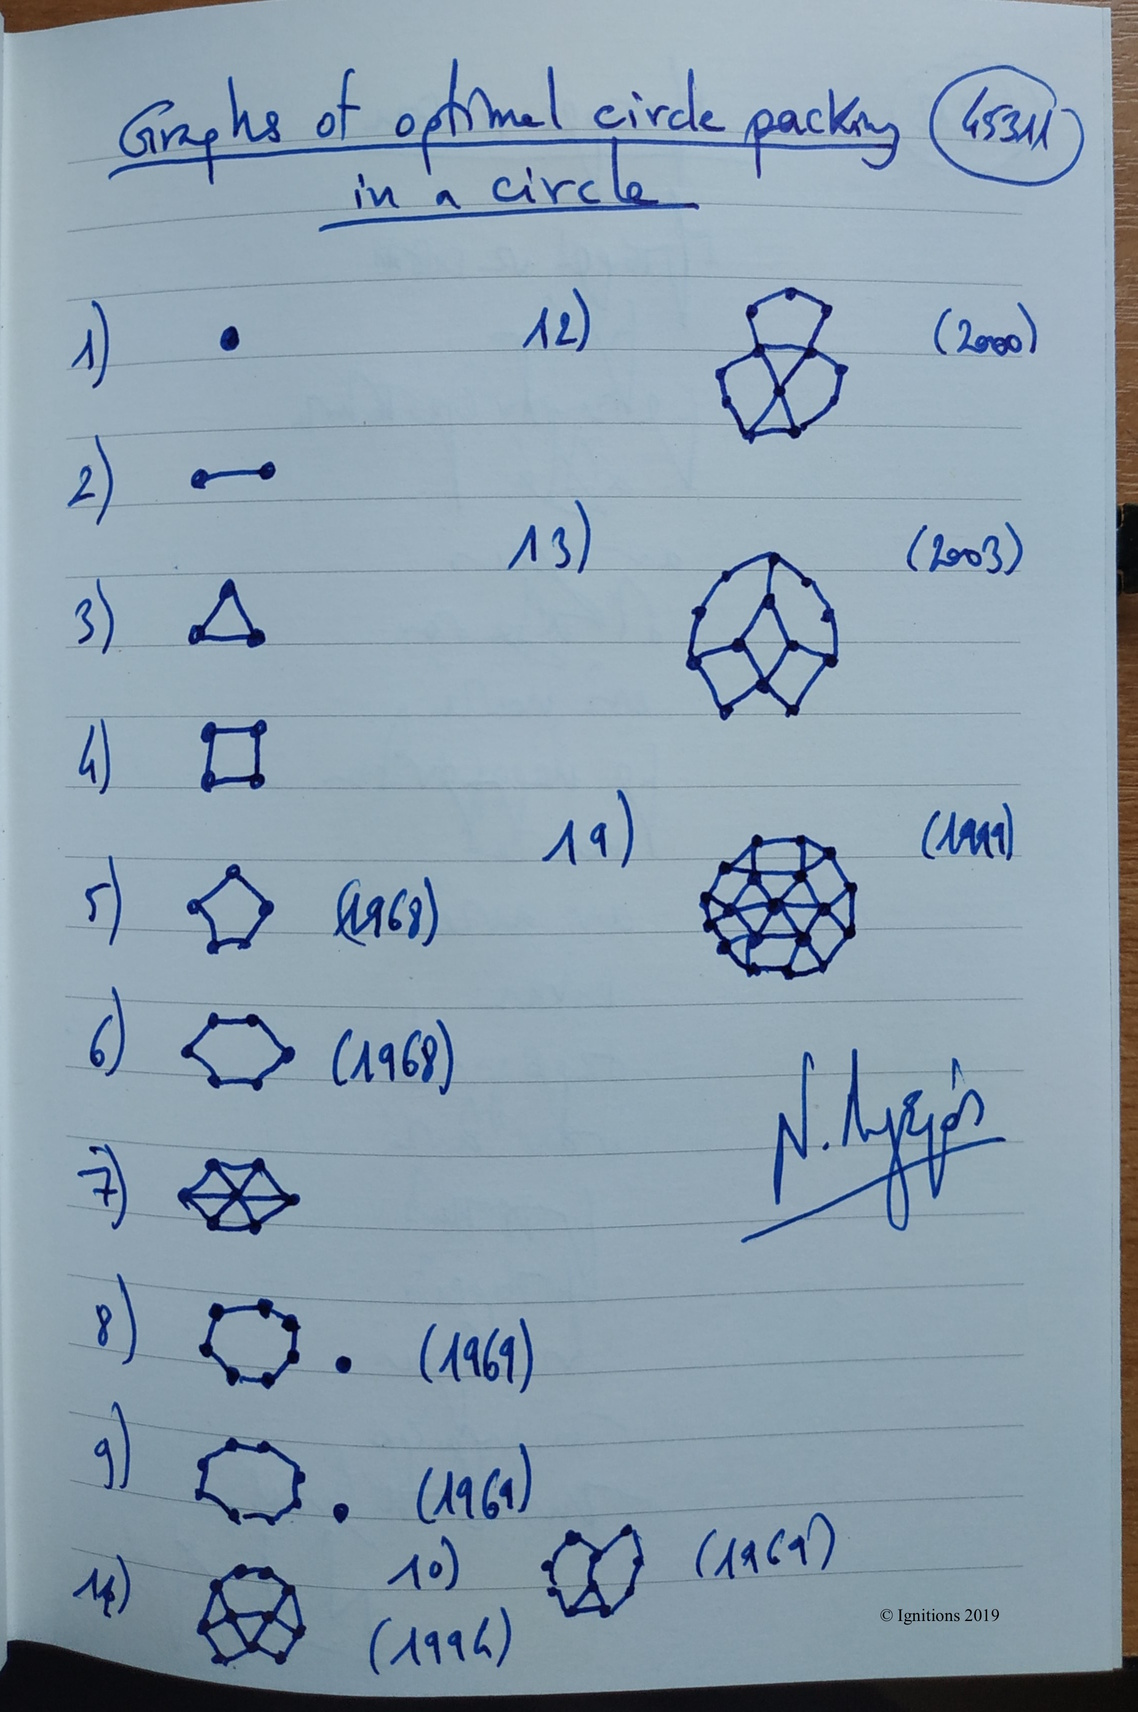 Graphs of optimal circle packing in a circle. (Dessin).